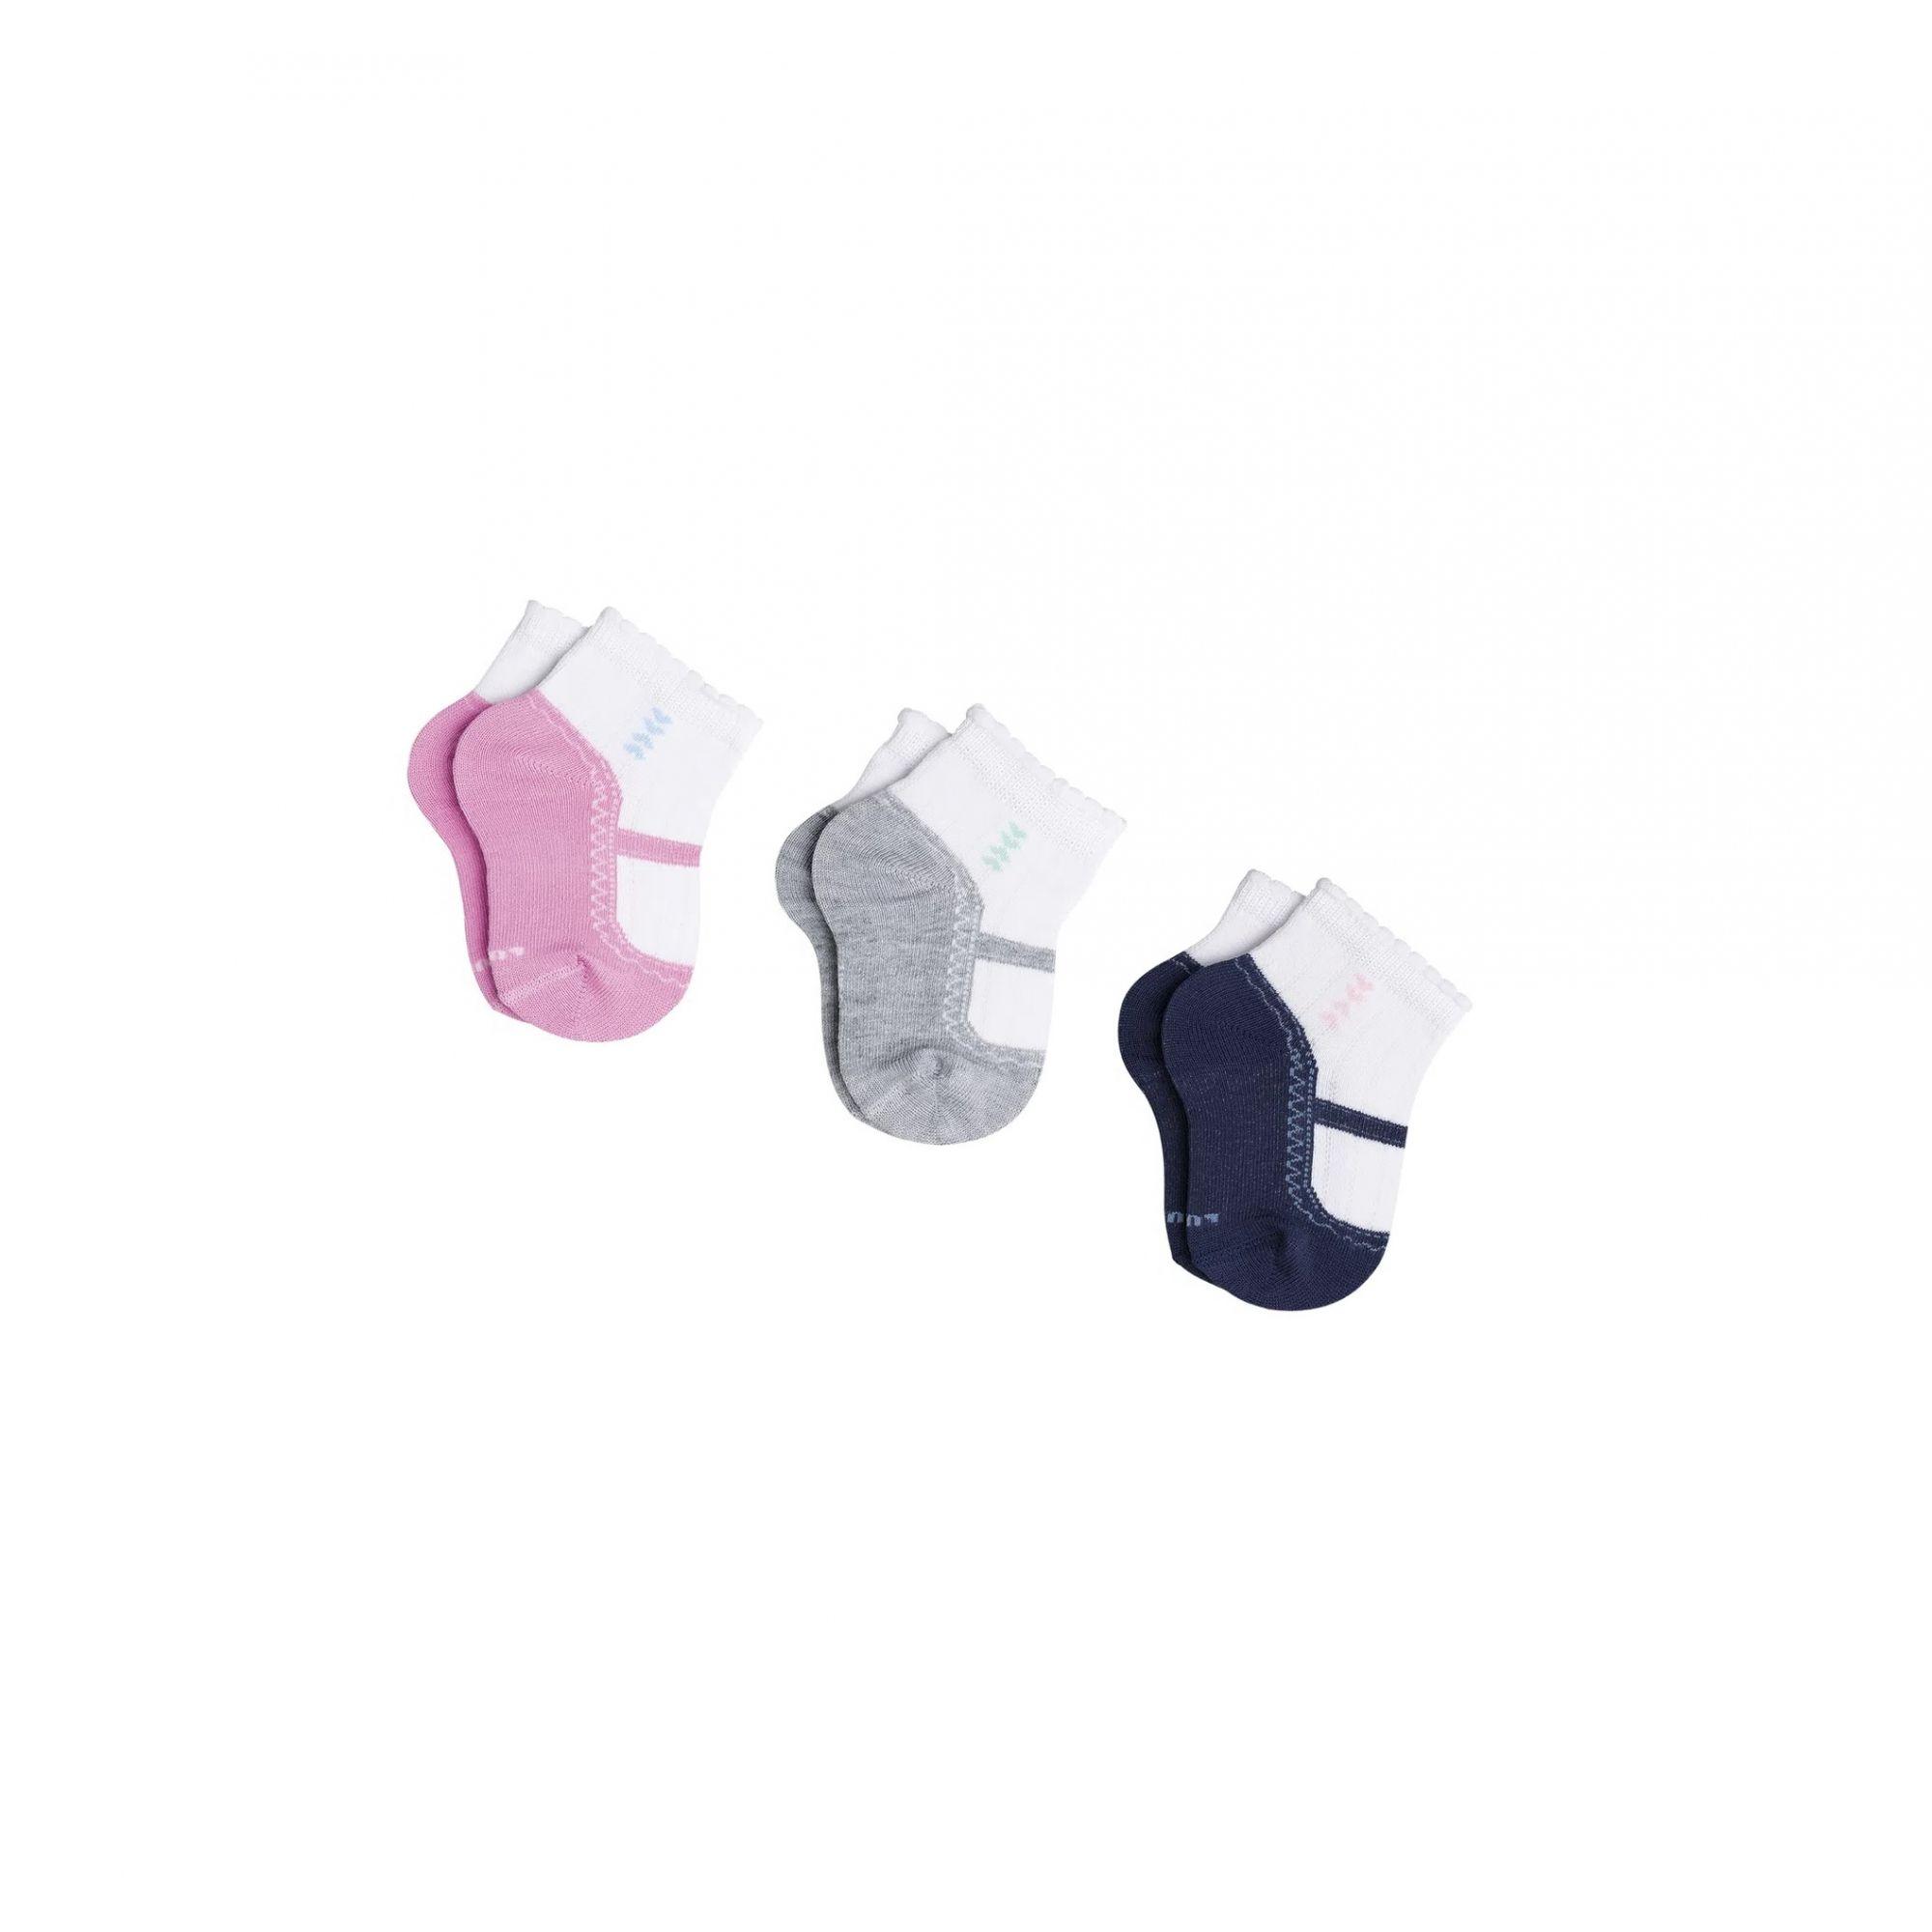 Kit 3 Meias Baby Recém Nascido Kids Menina Lupo 2000-989